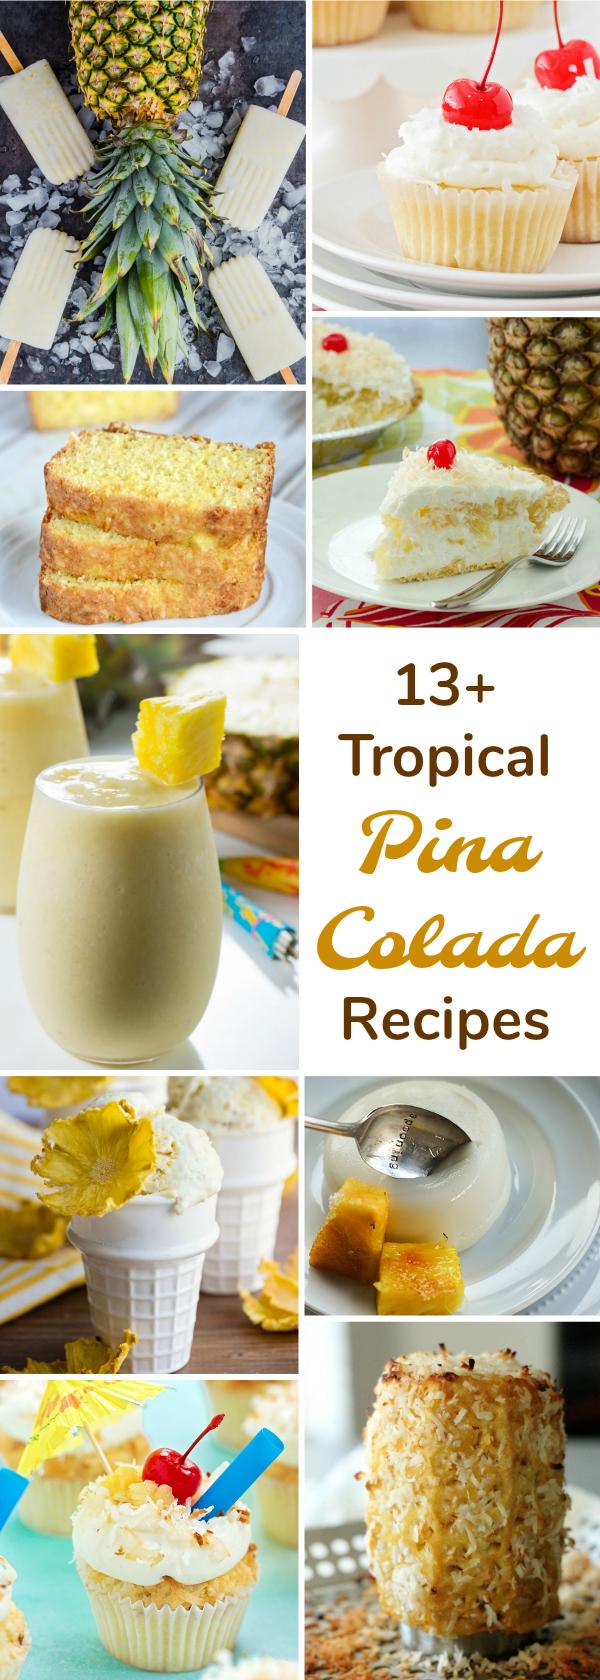 13 + Pina Colada Recipes | realmomkitchen.com #celebratingfoodholidays